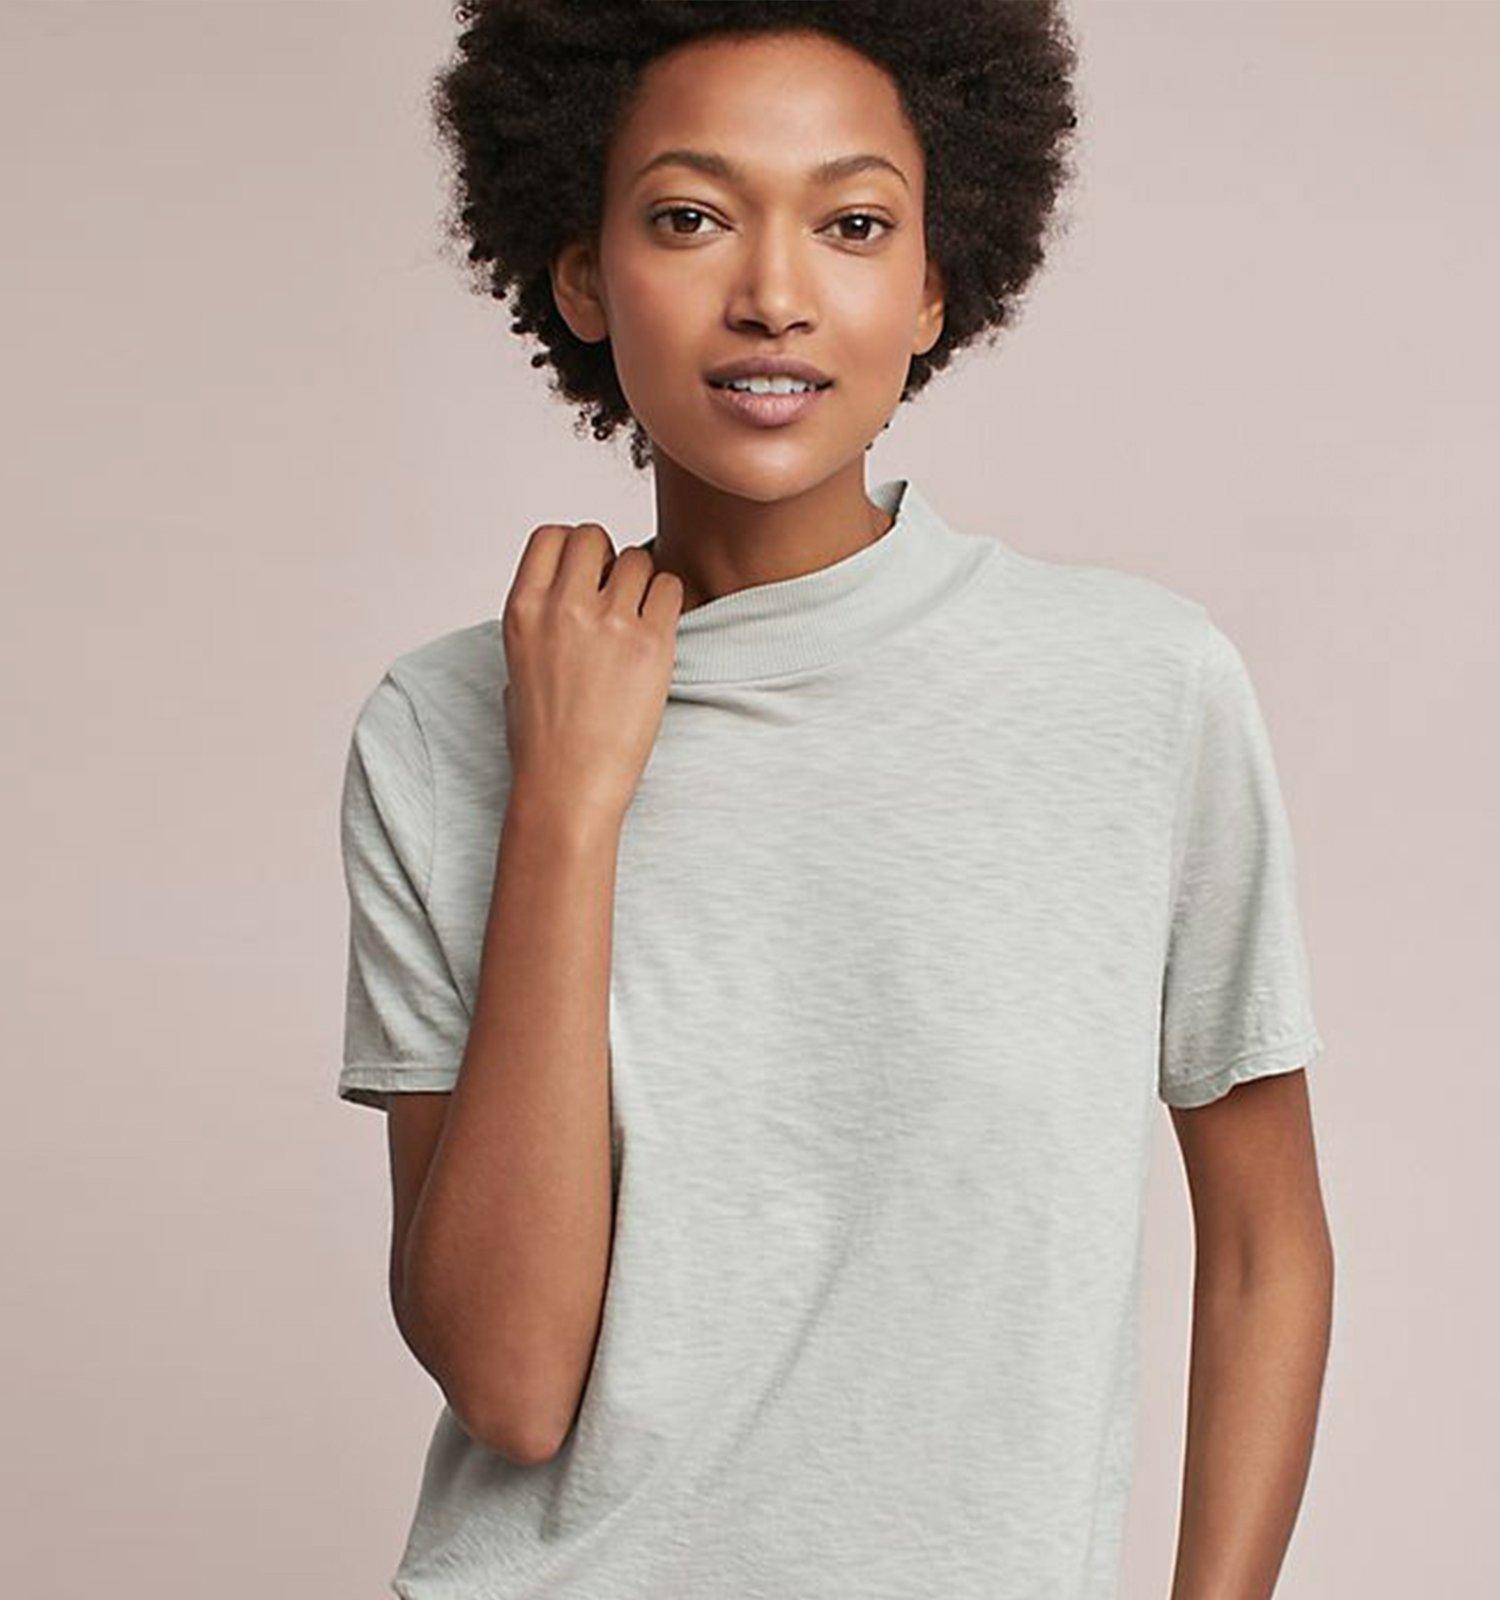 woman wearing michael stars clothing